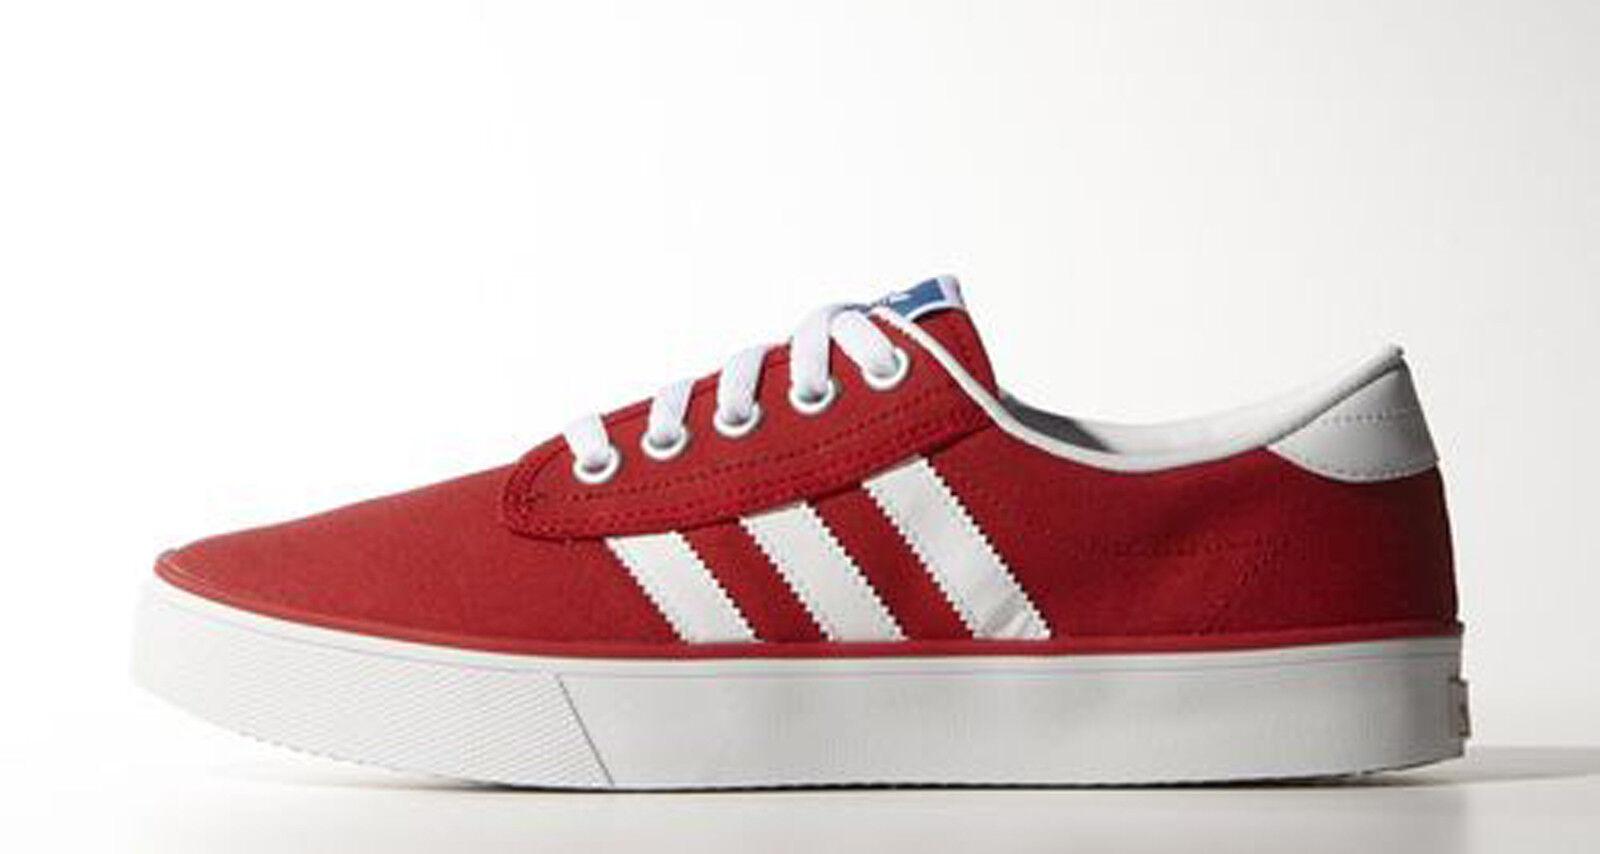 Adidas KIEL Unisex Rossa - M20323 scarpe tela NEW